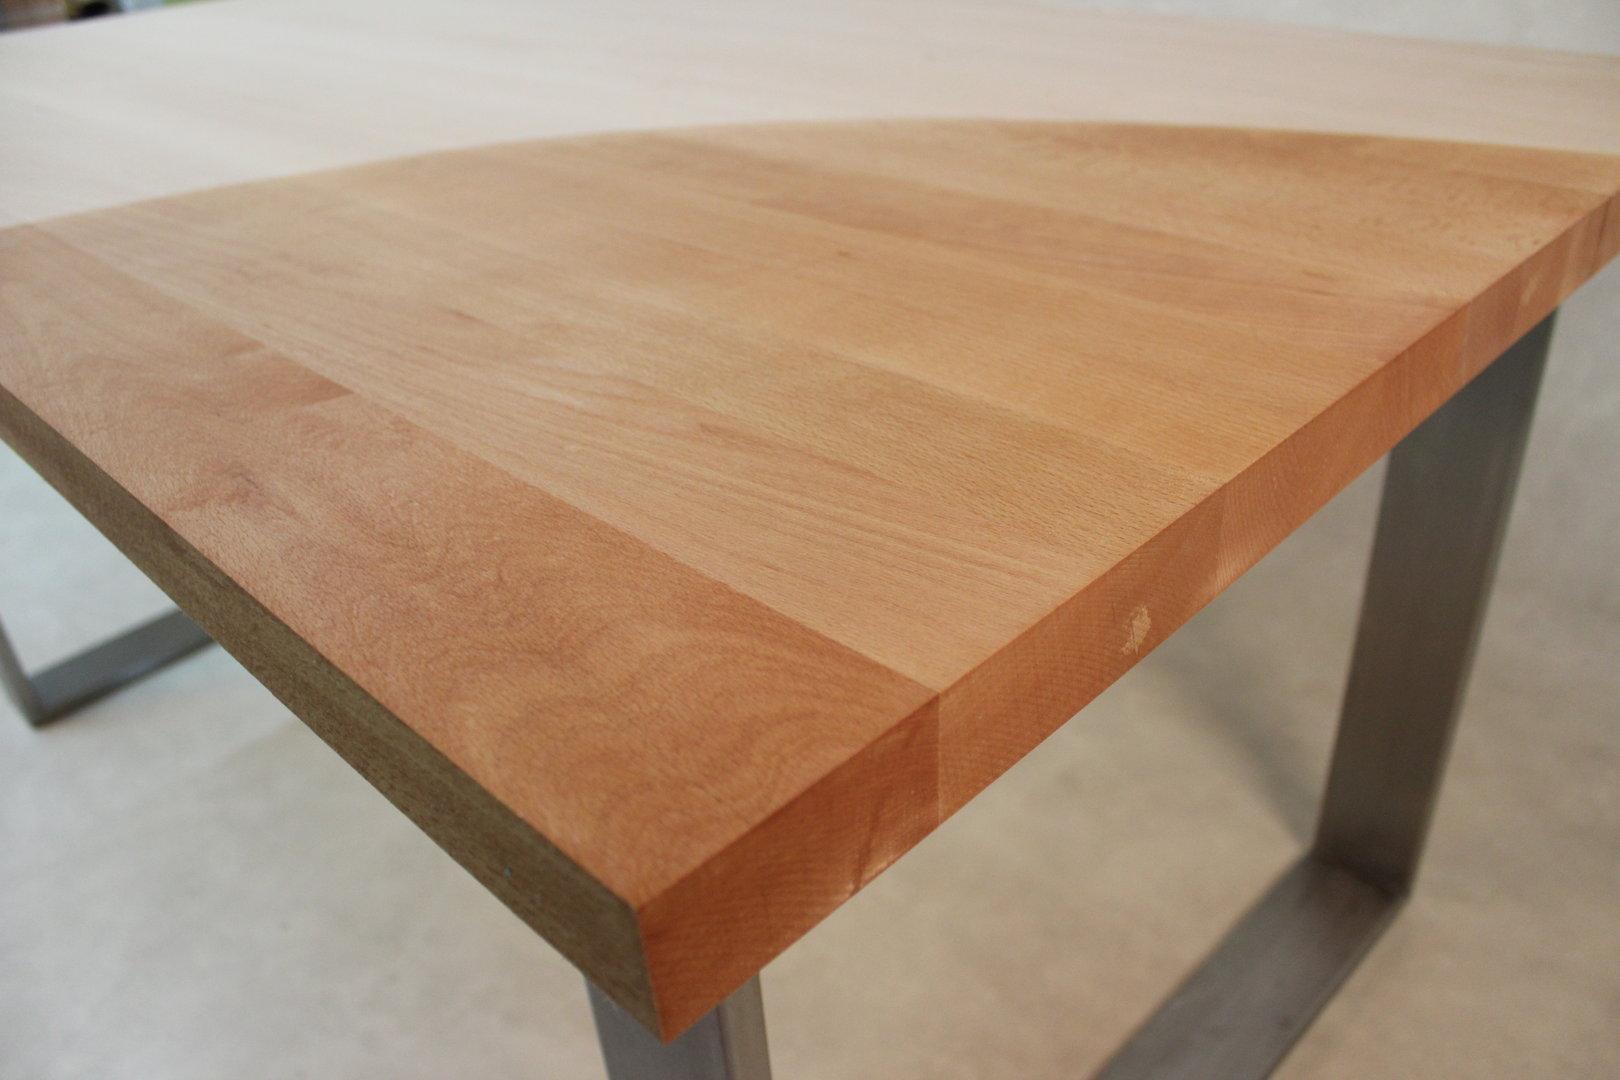 Tischplatte massivholz buche dl fsc 40 2200 1000 for Tischplatte massivholz